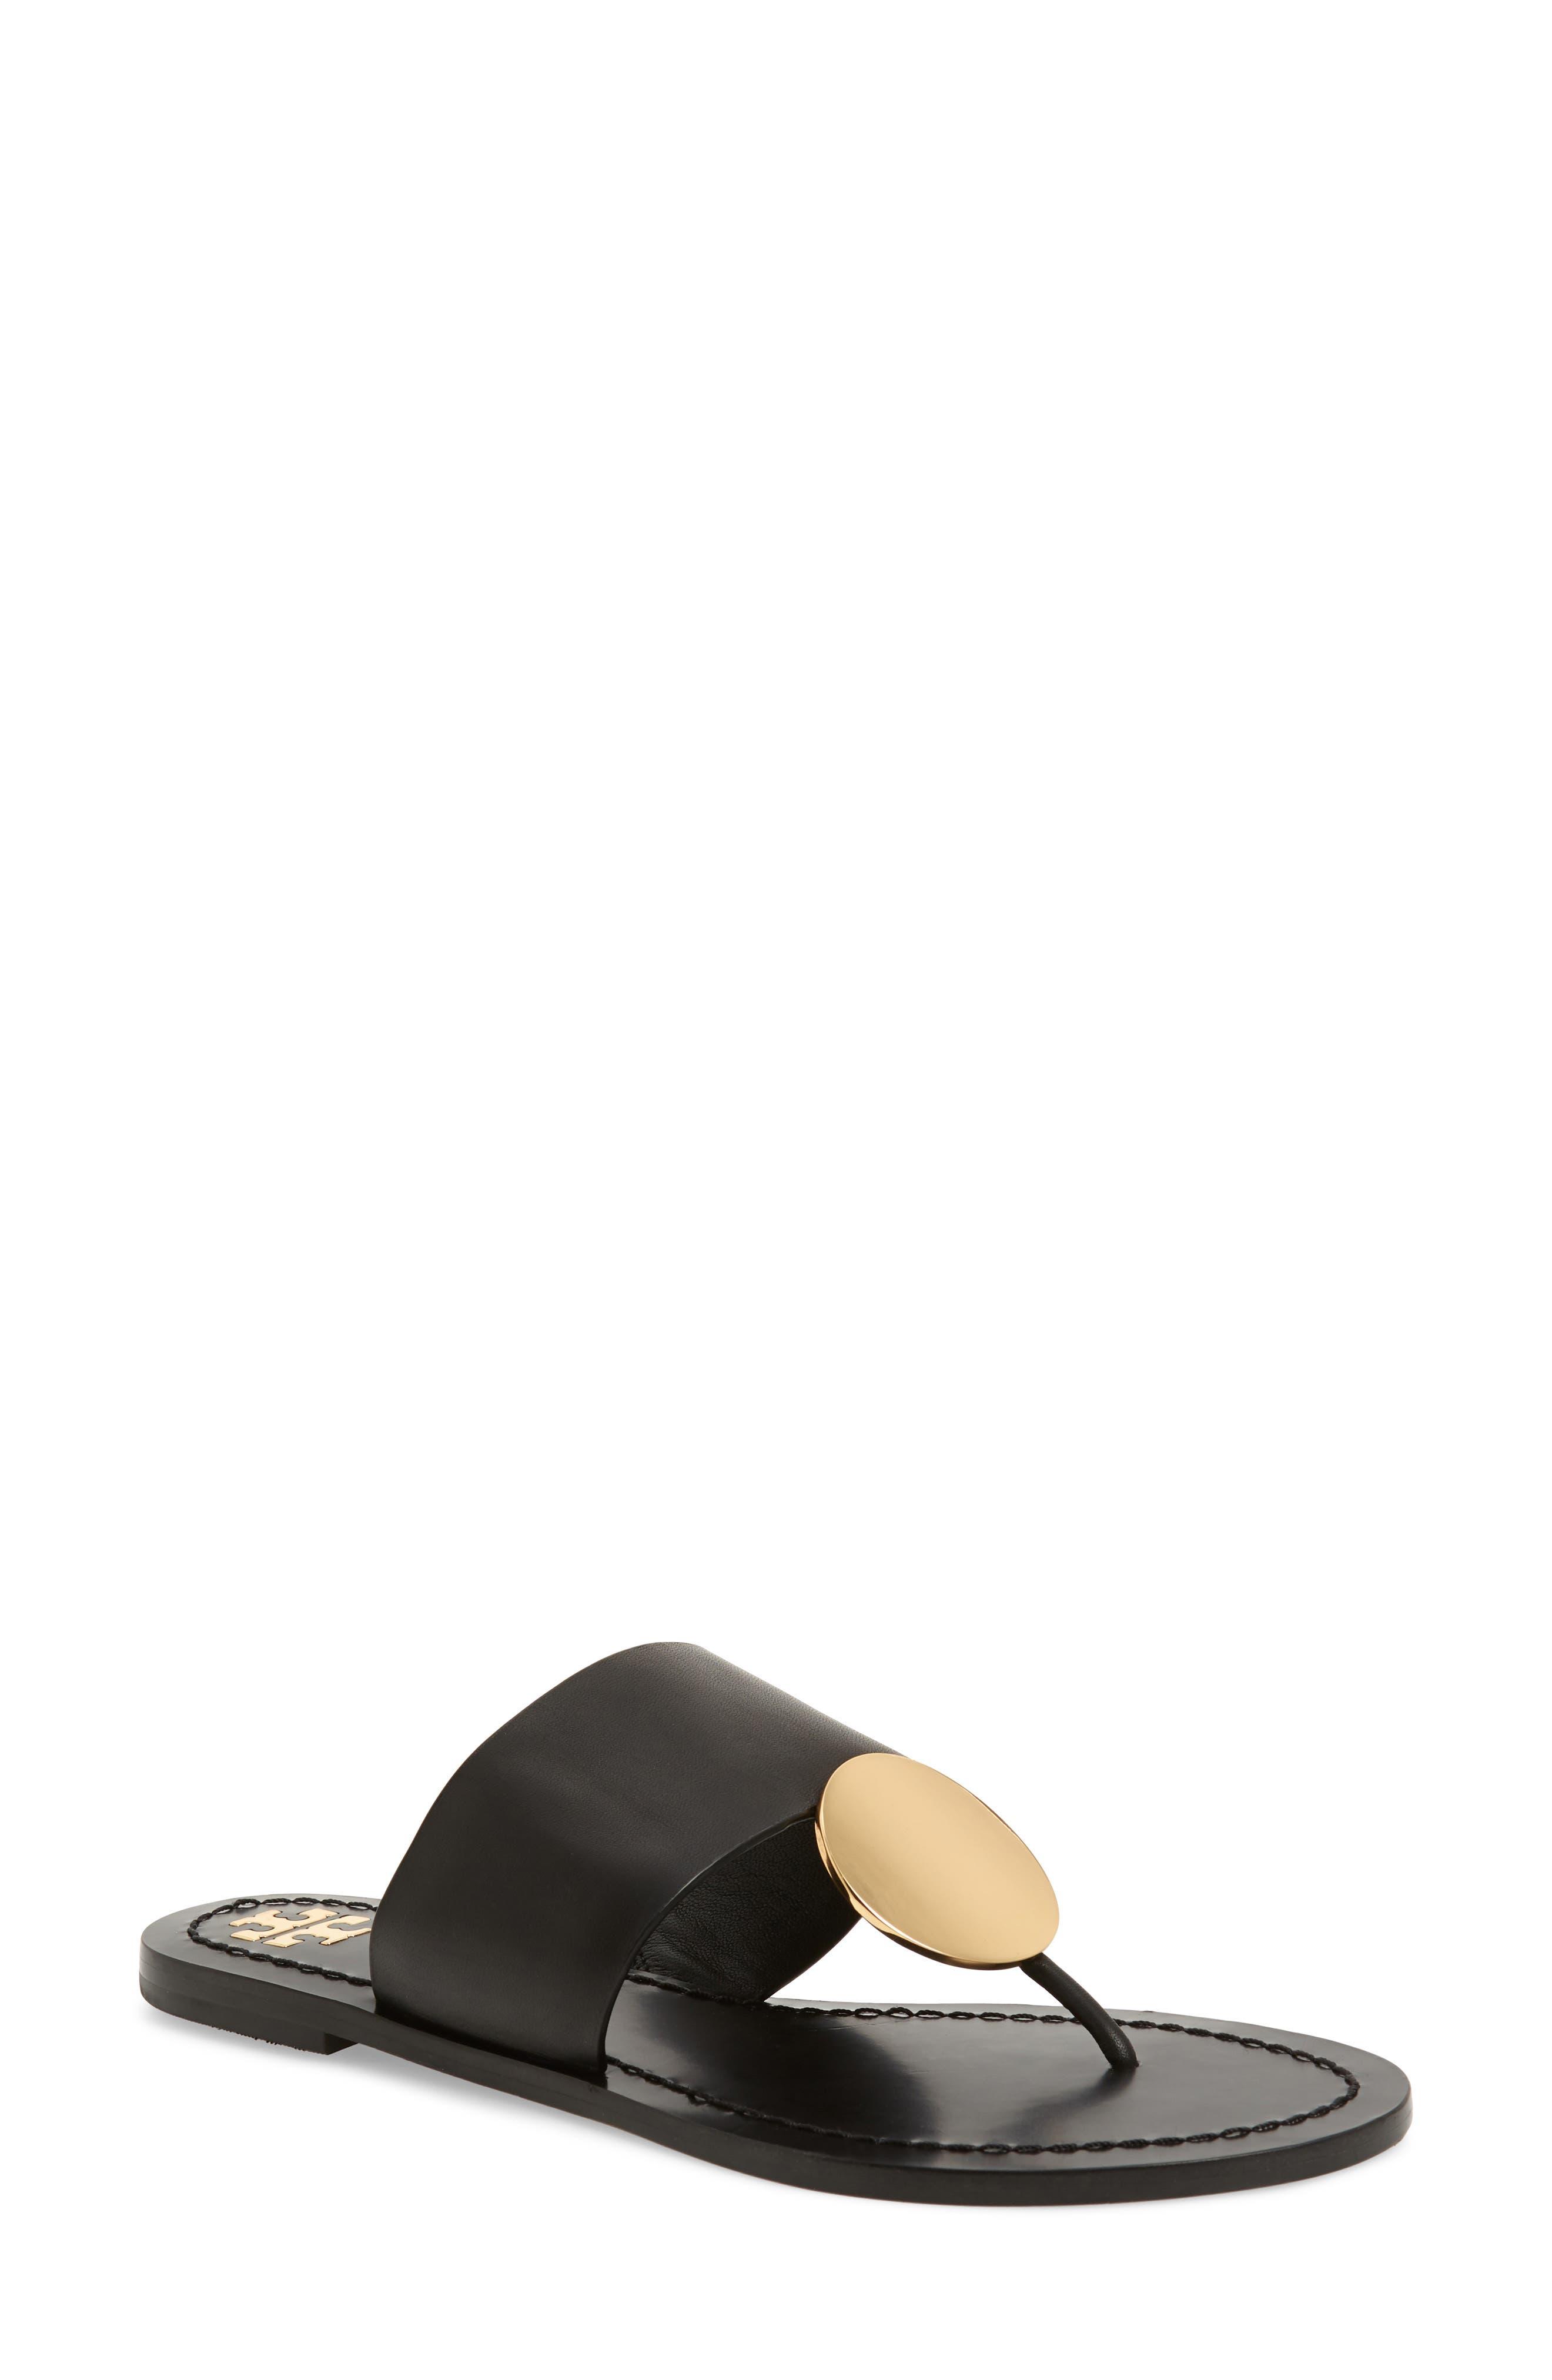 Tory Burch Patos Sandal, Black